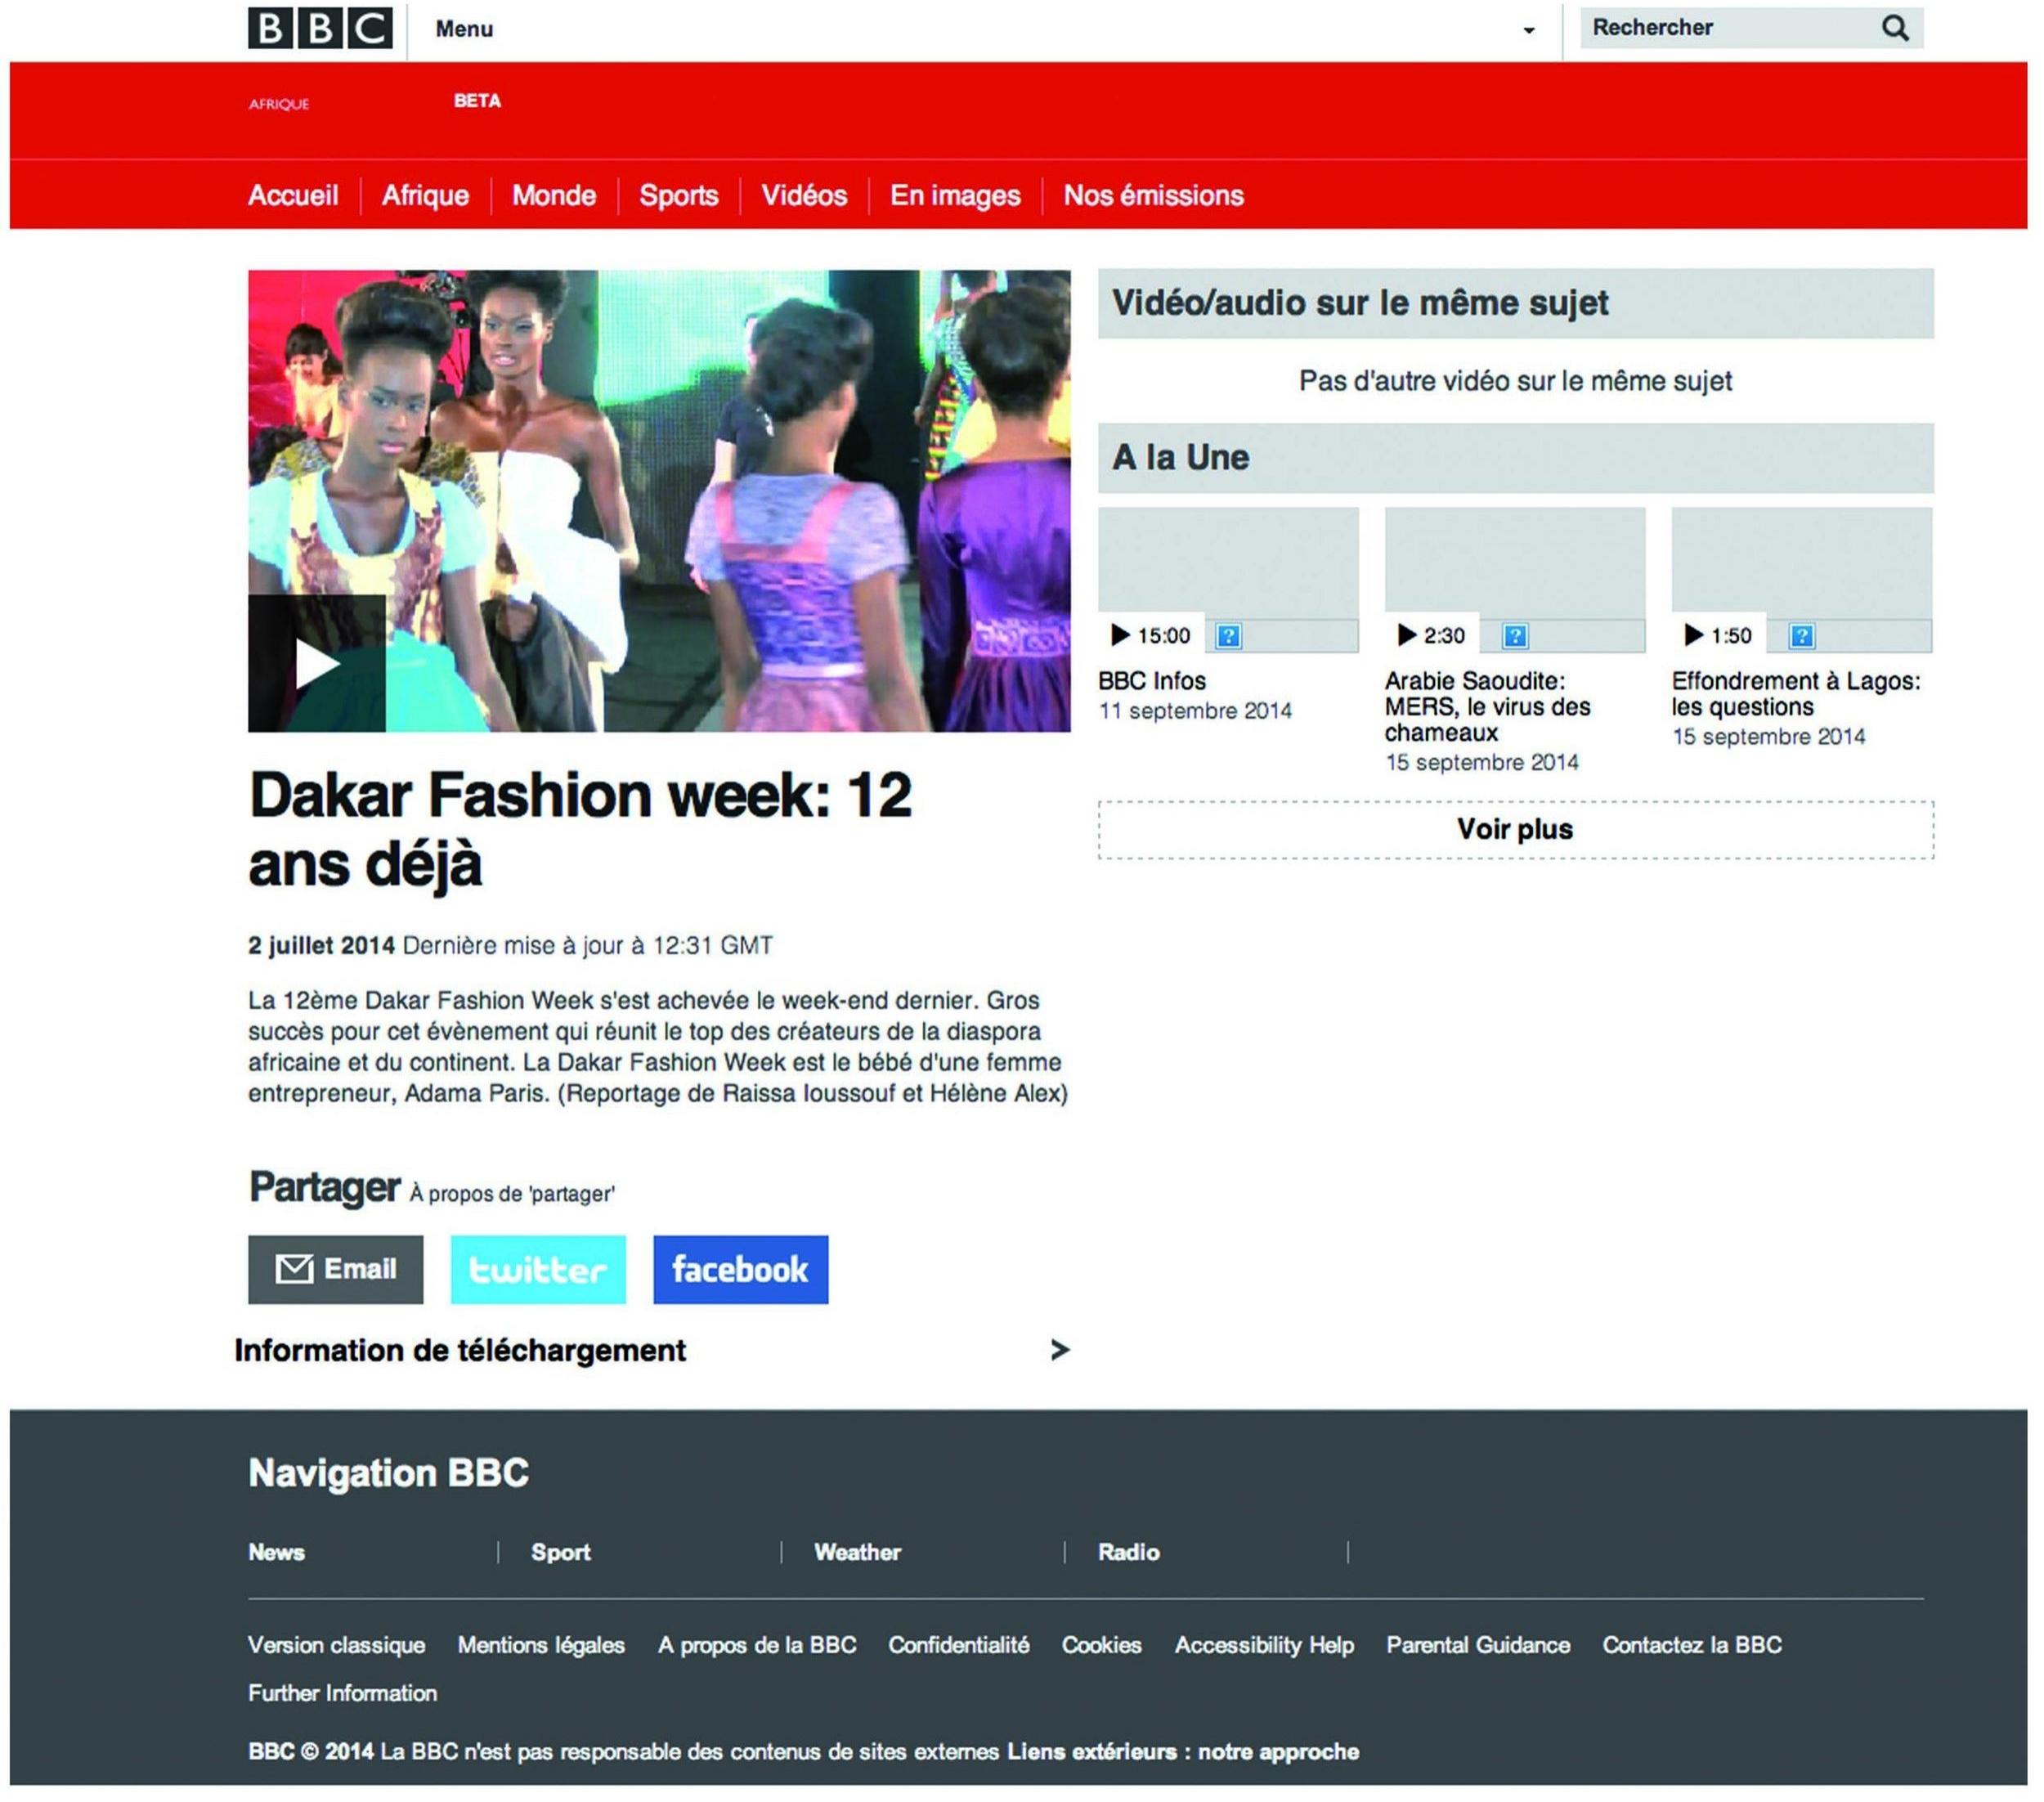 Copy of BBC